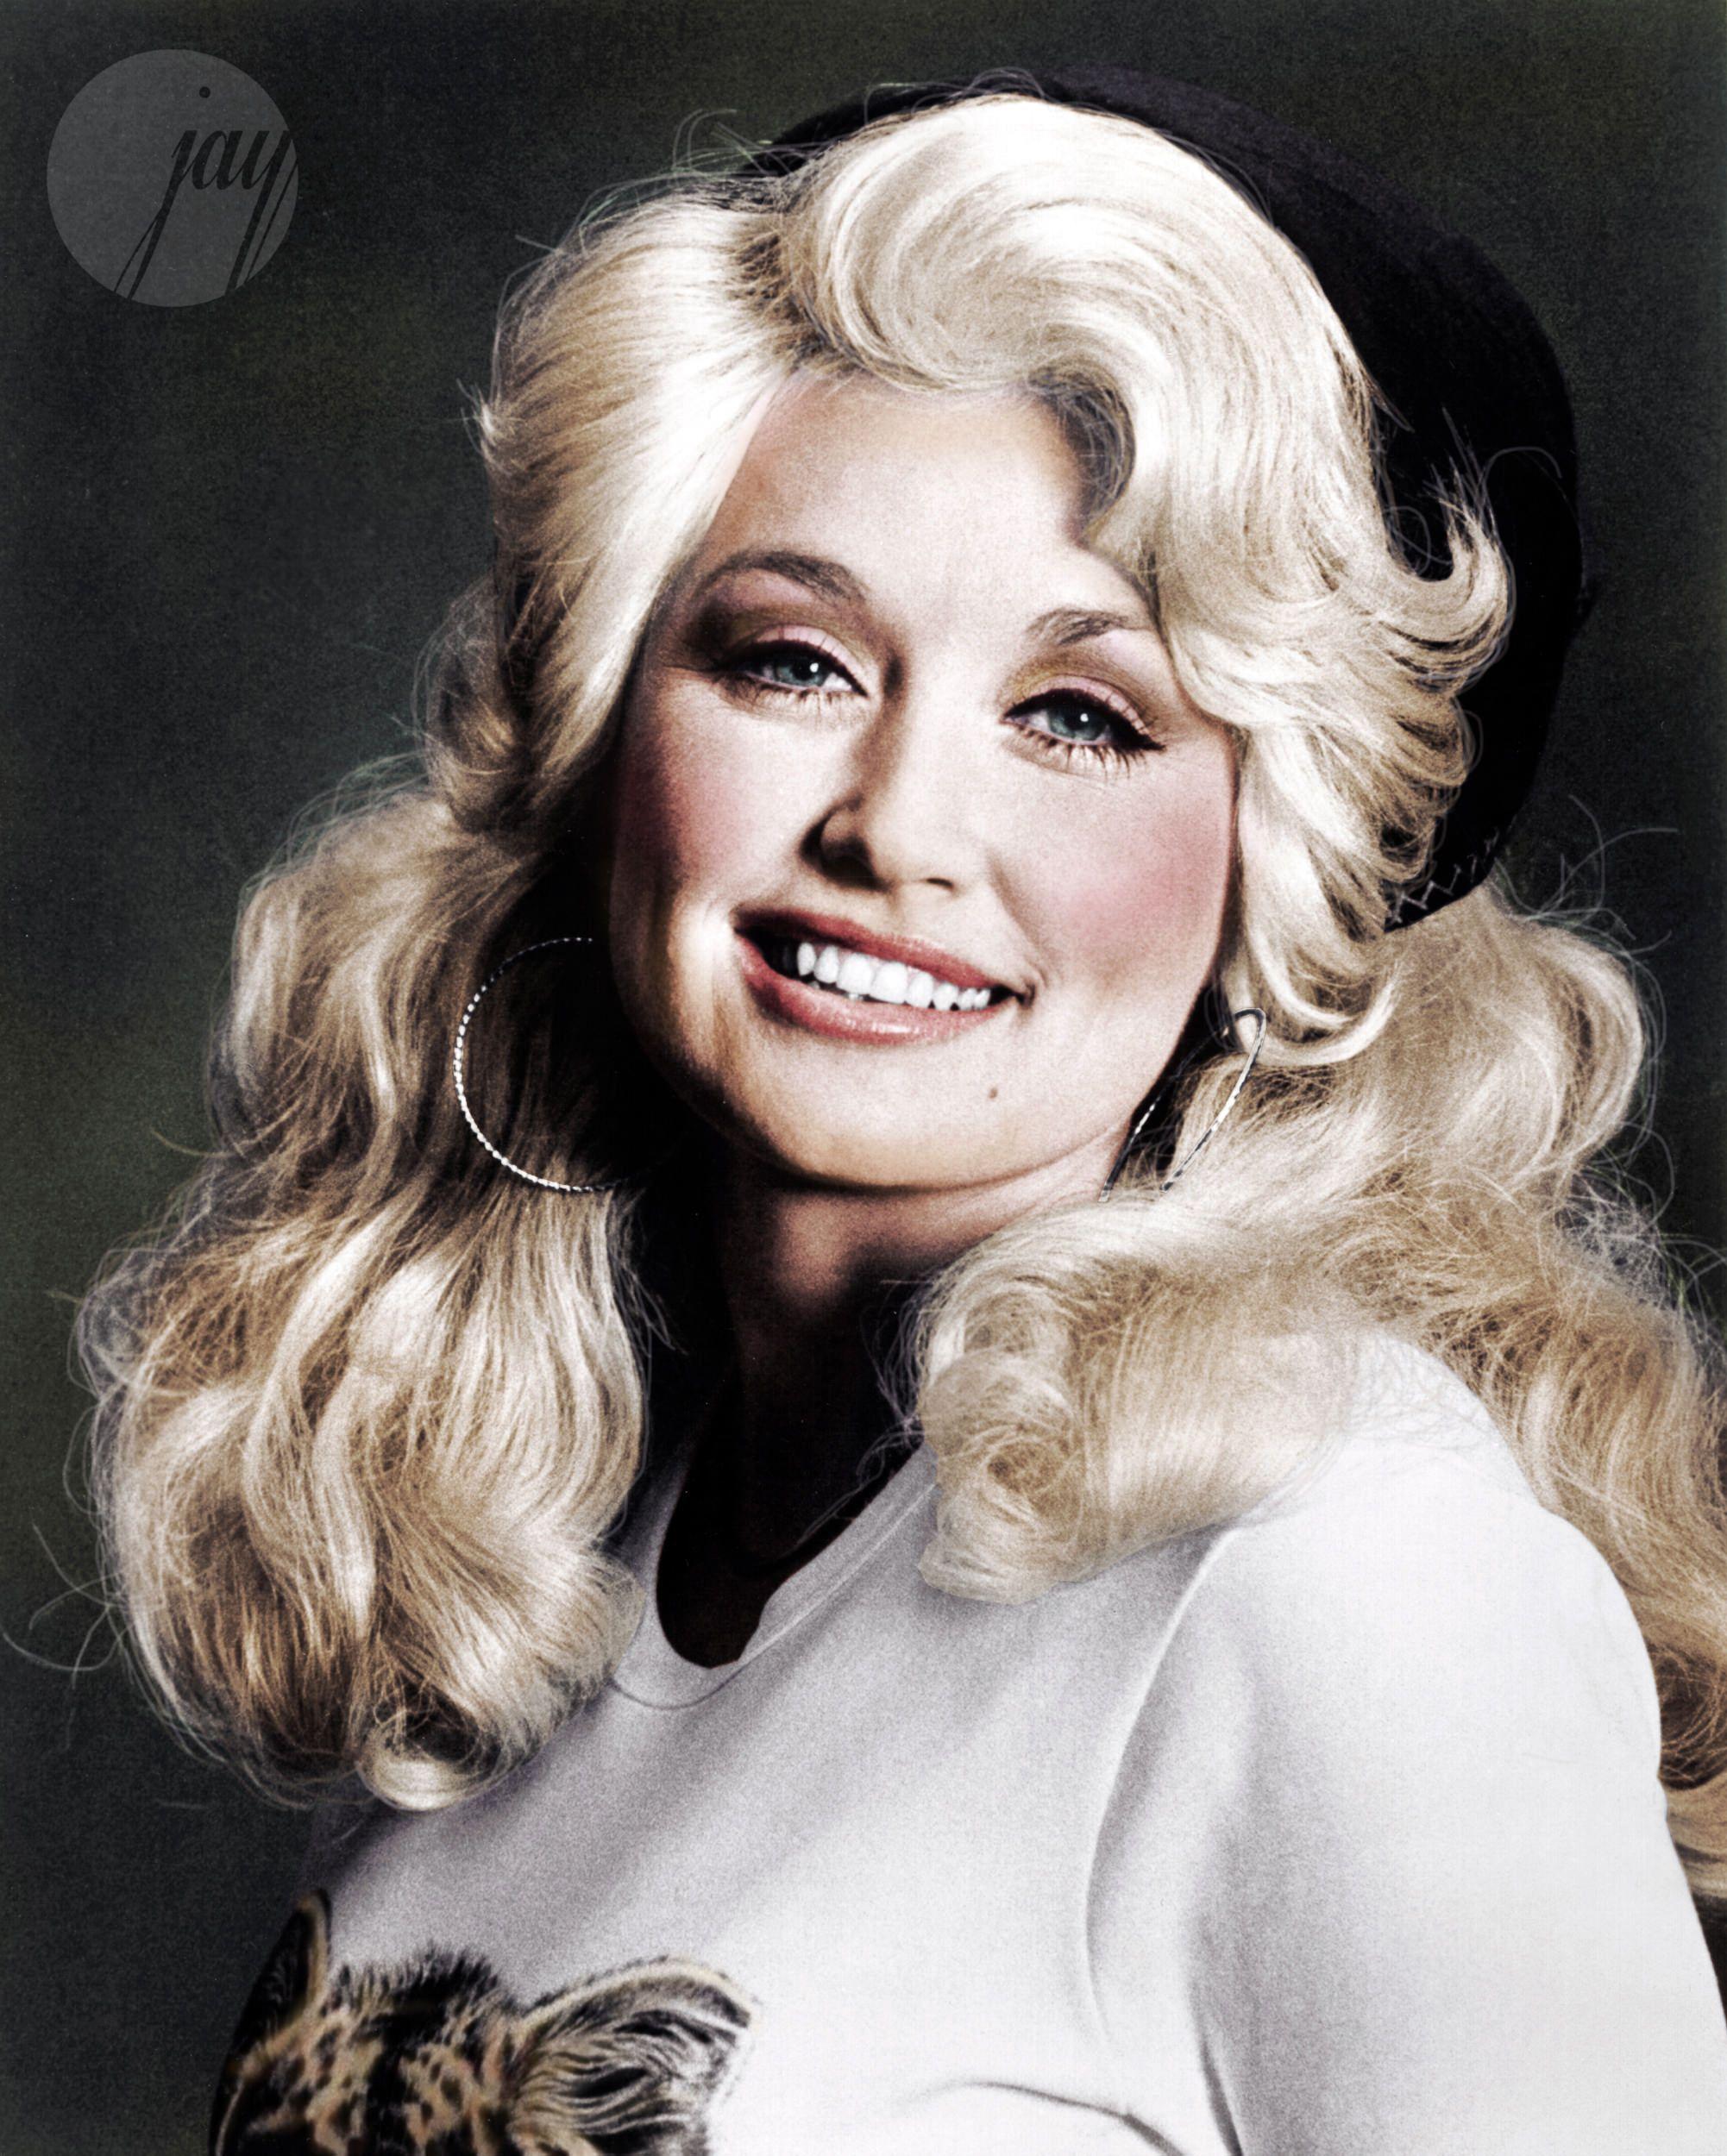 Dolly Parton Dolly parton, Dolly parton young, Dolly